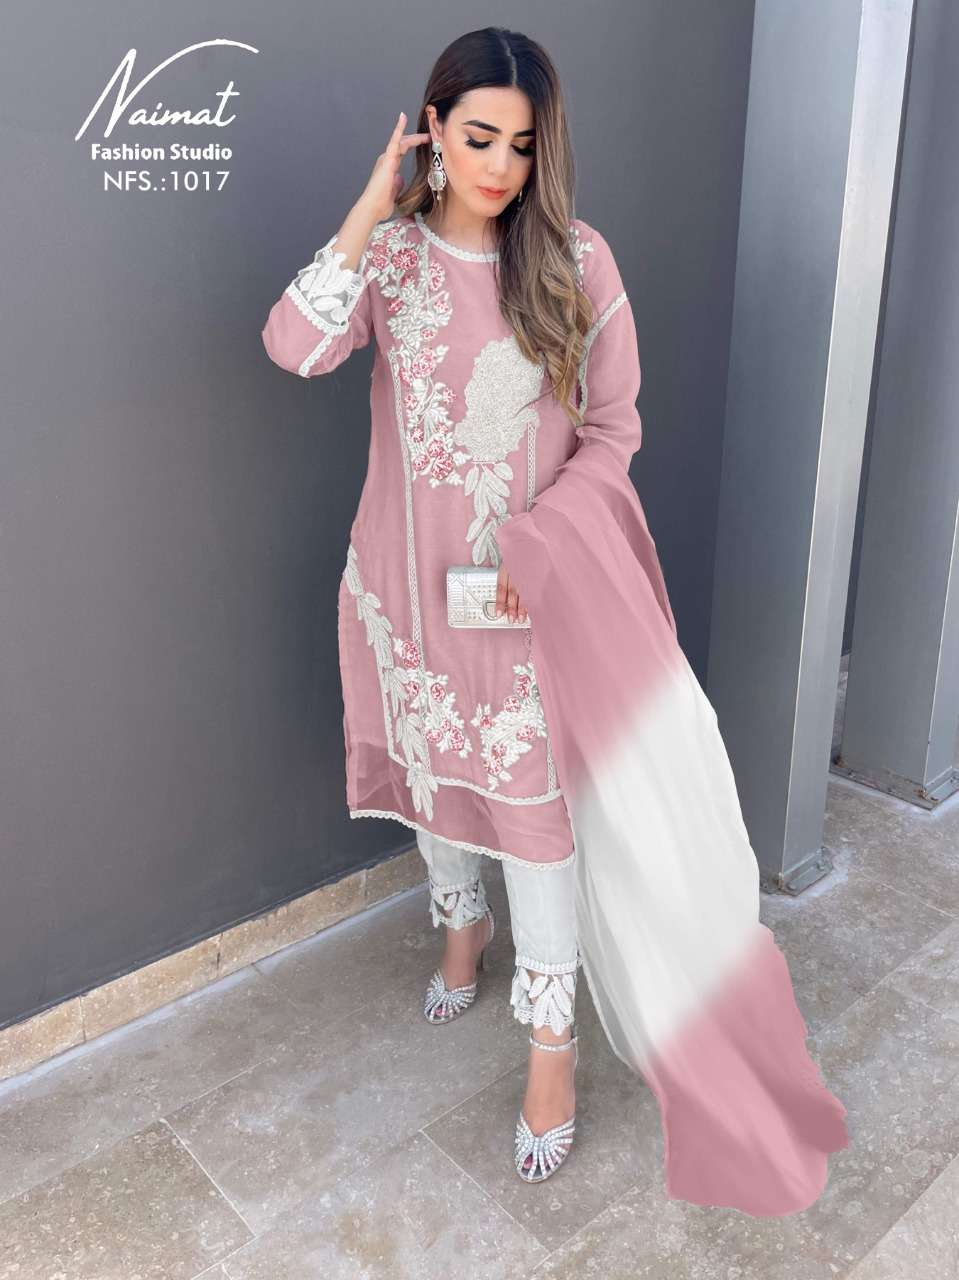 naimat fashion studio nfs 1017 beautiful designer kurti with botton and dupatta